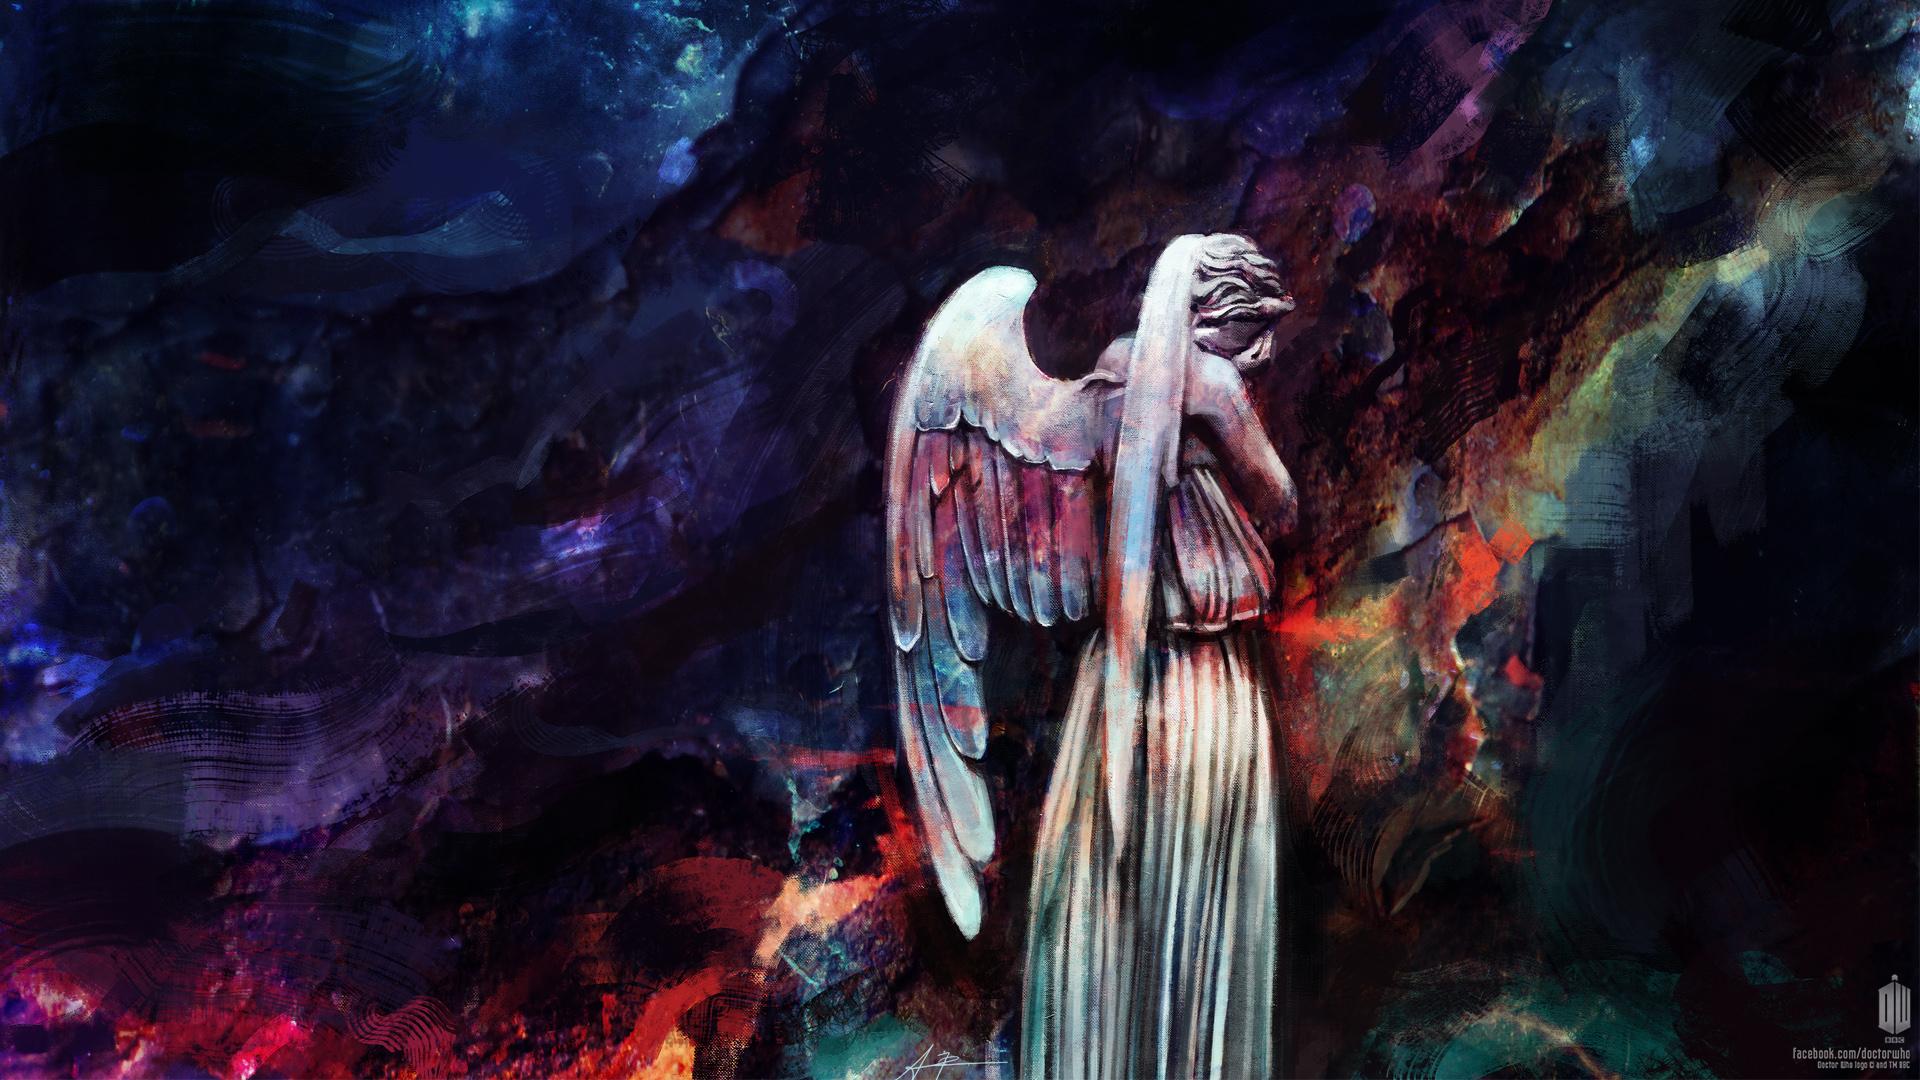 Weeping angels wallpaper   SF Wallpaper 1920x1080